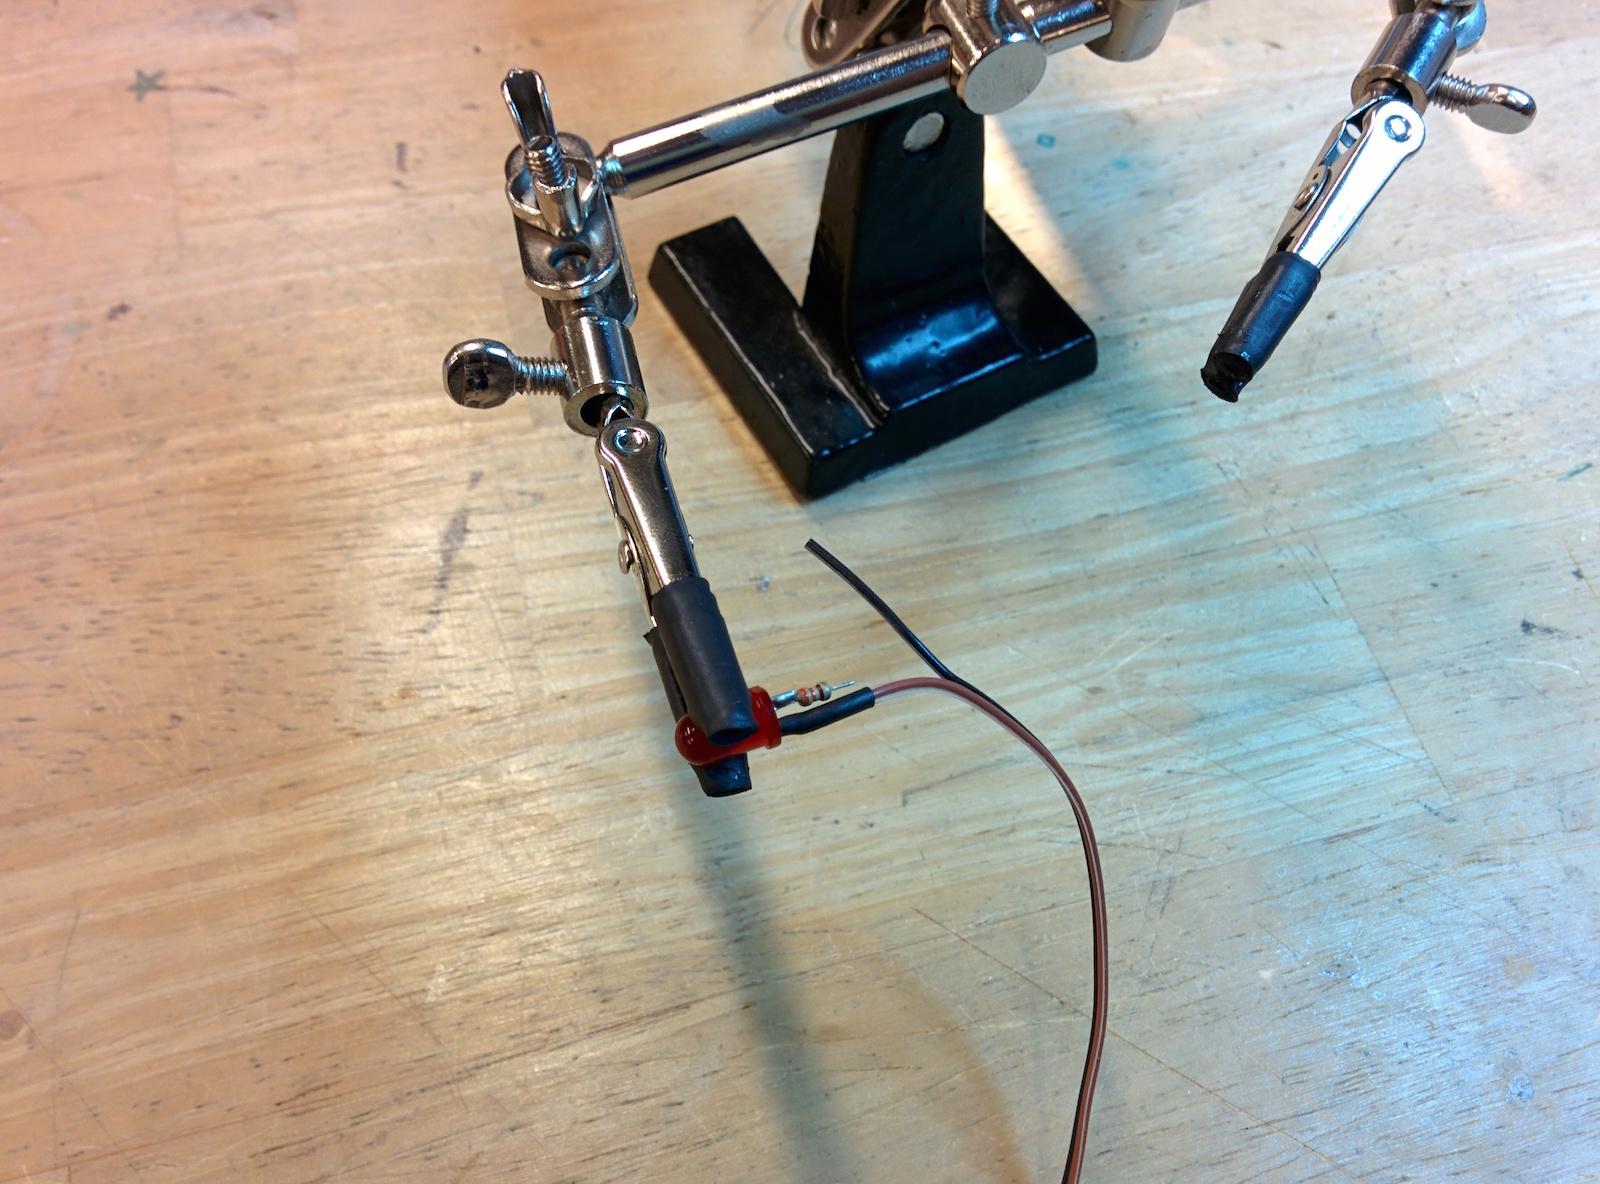 Ono Wiring the frame · OPSORO/opsoro-ONO-docs Wiki · GitHub